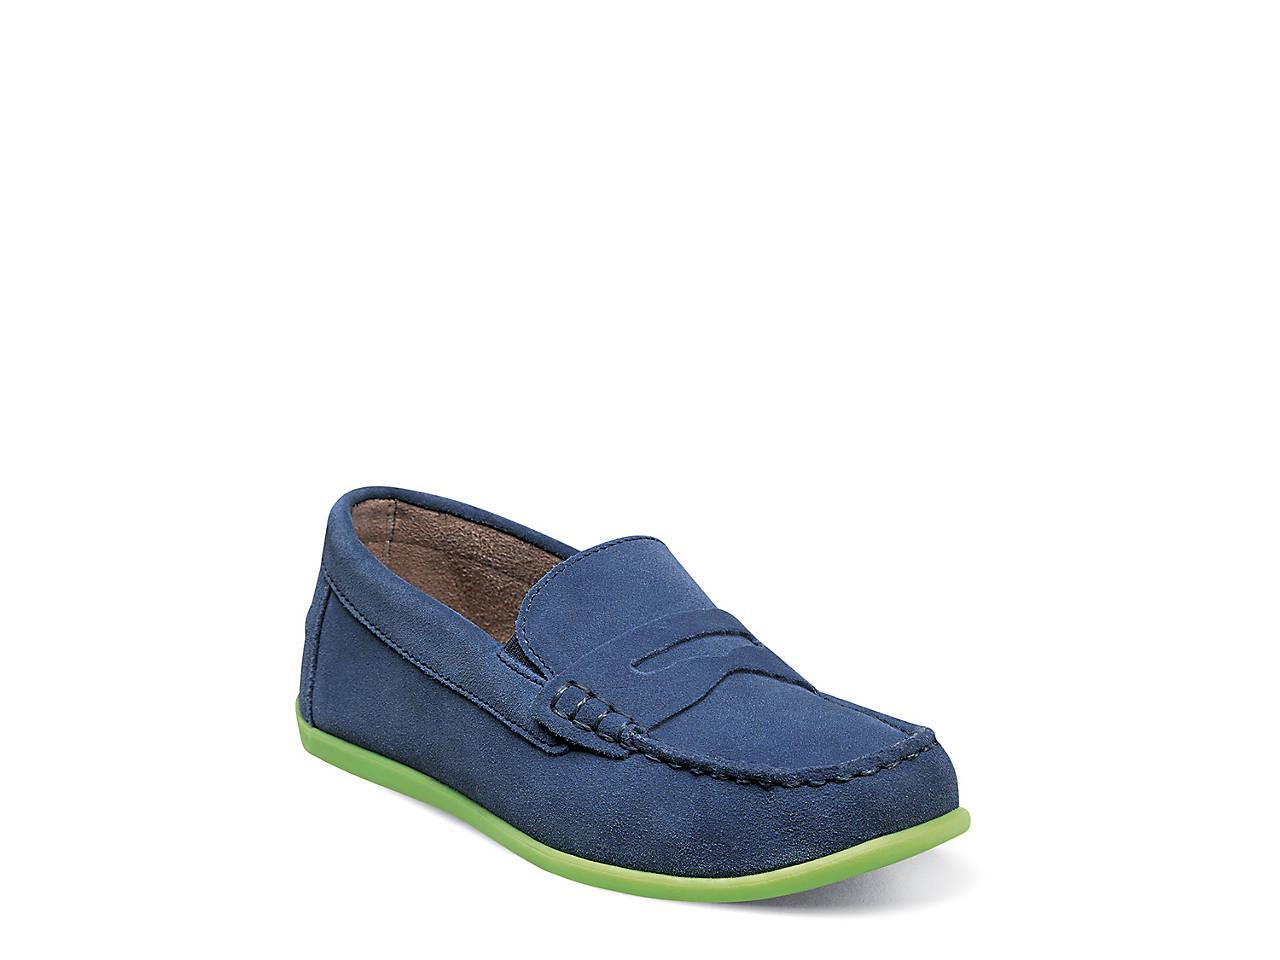 e9166378b59 Florsheim Jasper Toddler   Youth Penny Loafer Kids Shoes